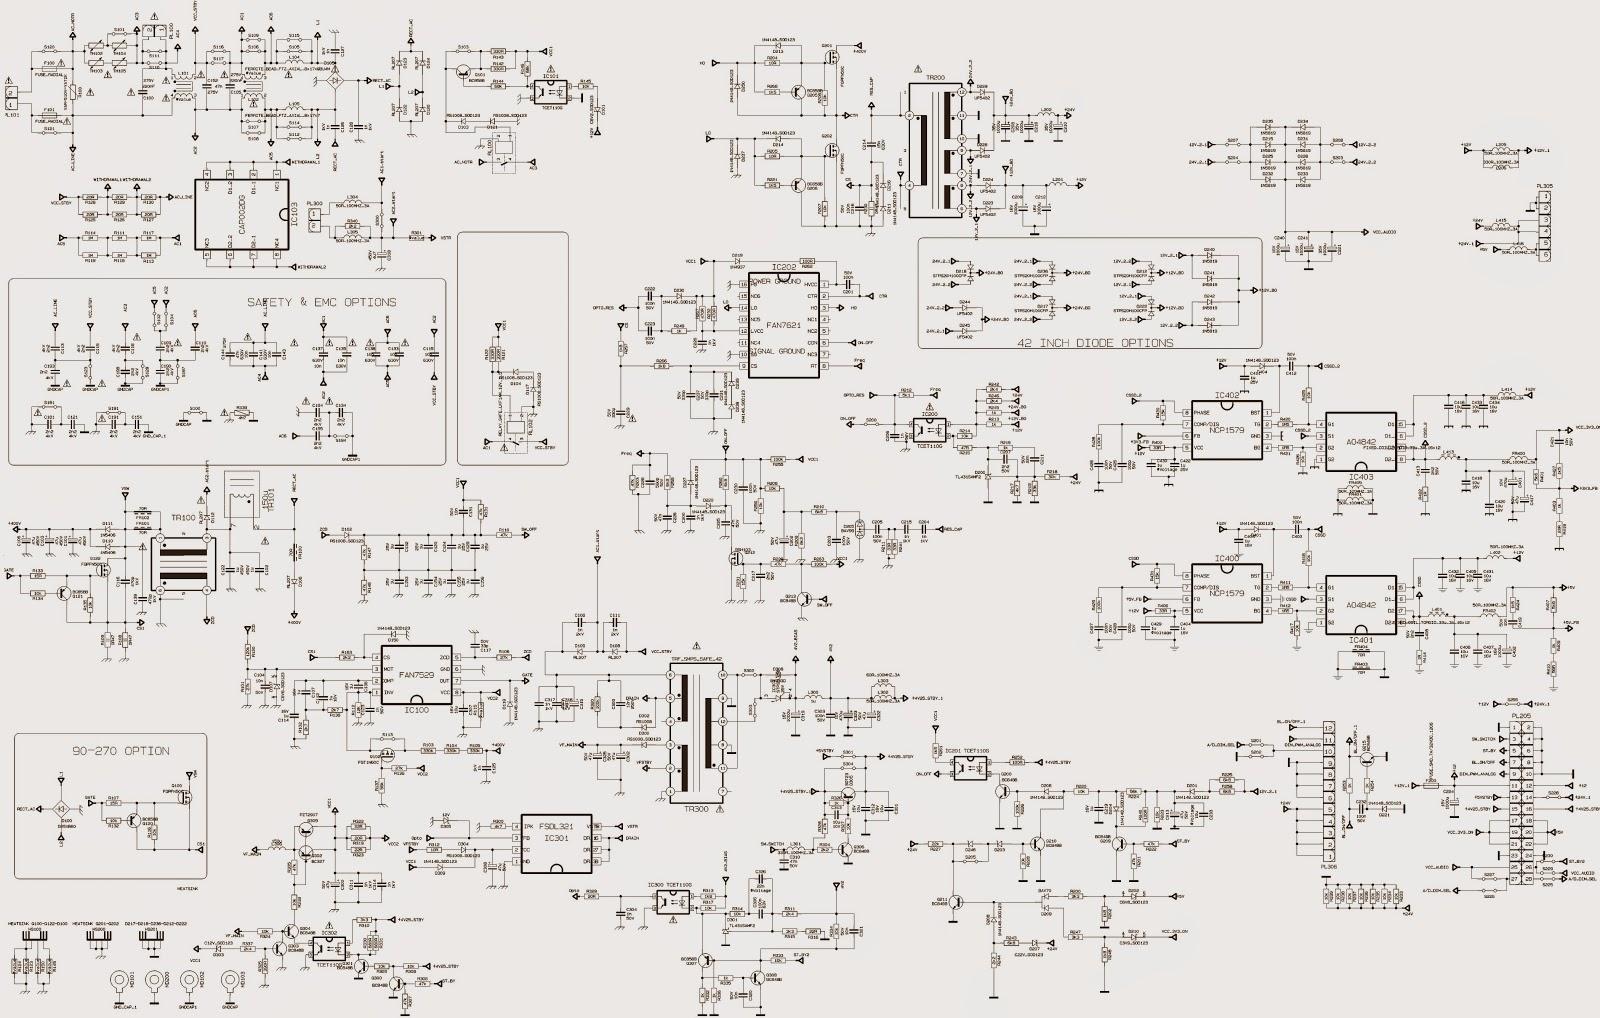 Smps Schematic Diagram Dsc 1616 Wiring Electro Help Vestel 17pw07  Power Supply